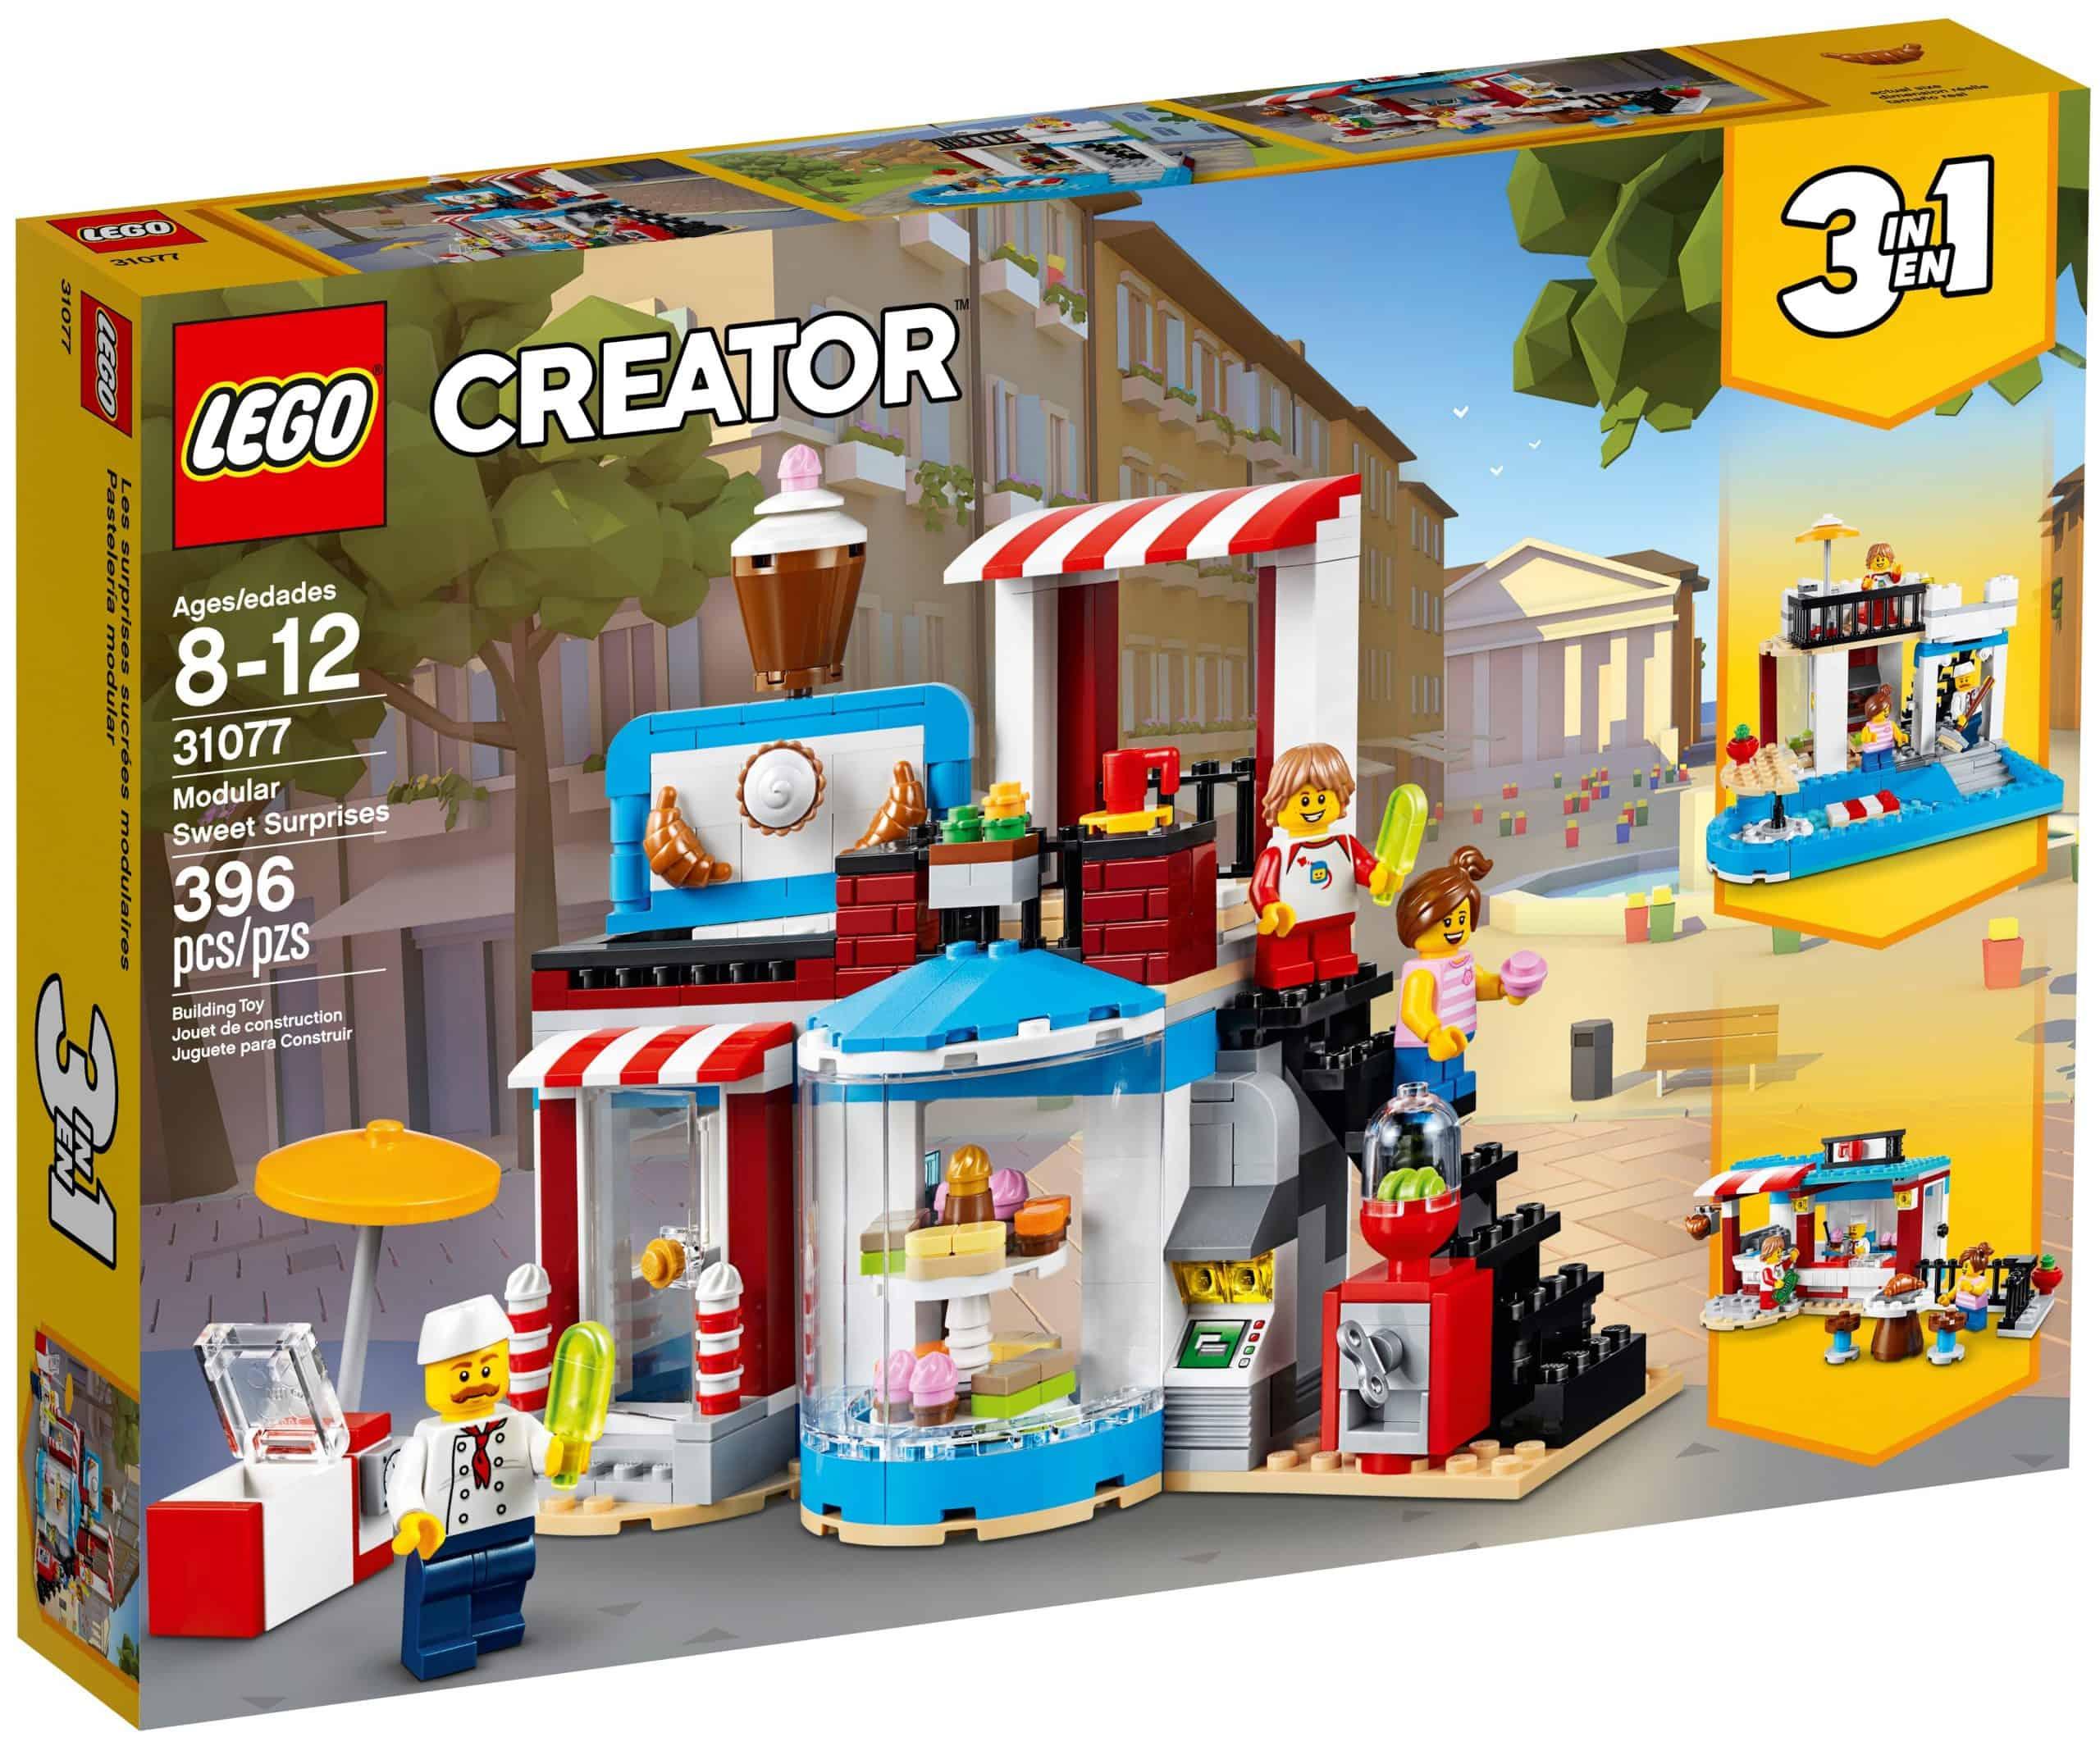 lego 31077 modulares zuckerhaus scaled